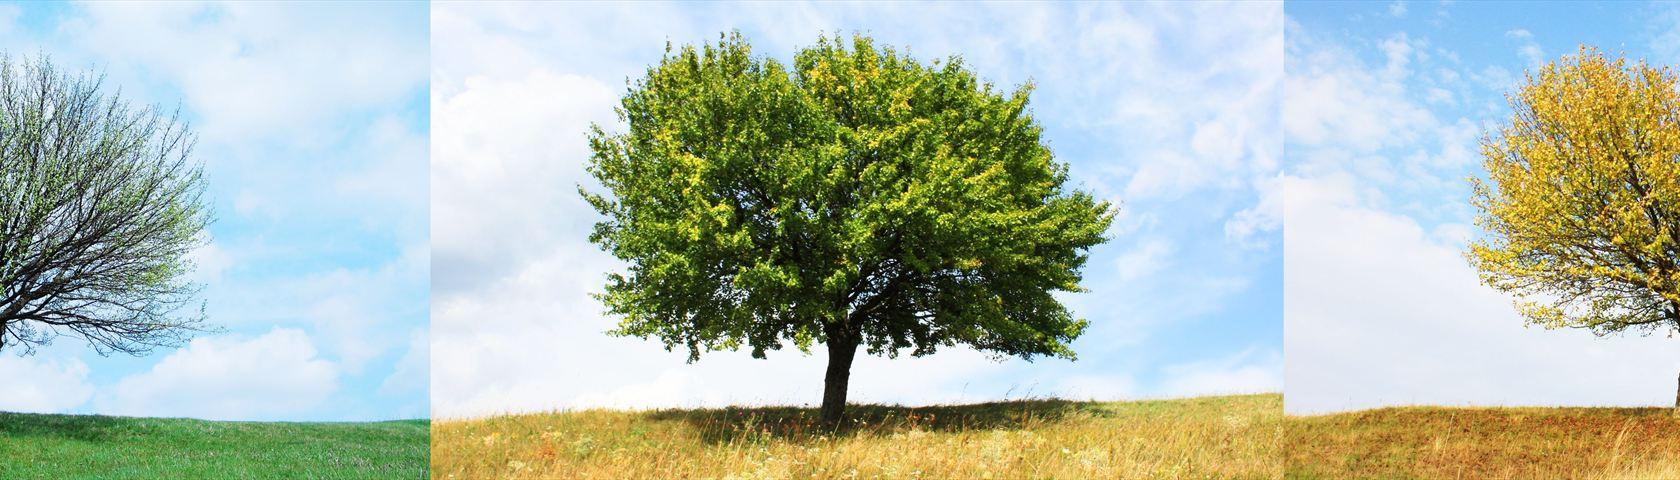 One Tree - Four Seasons